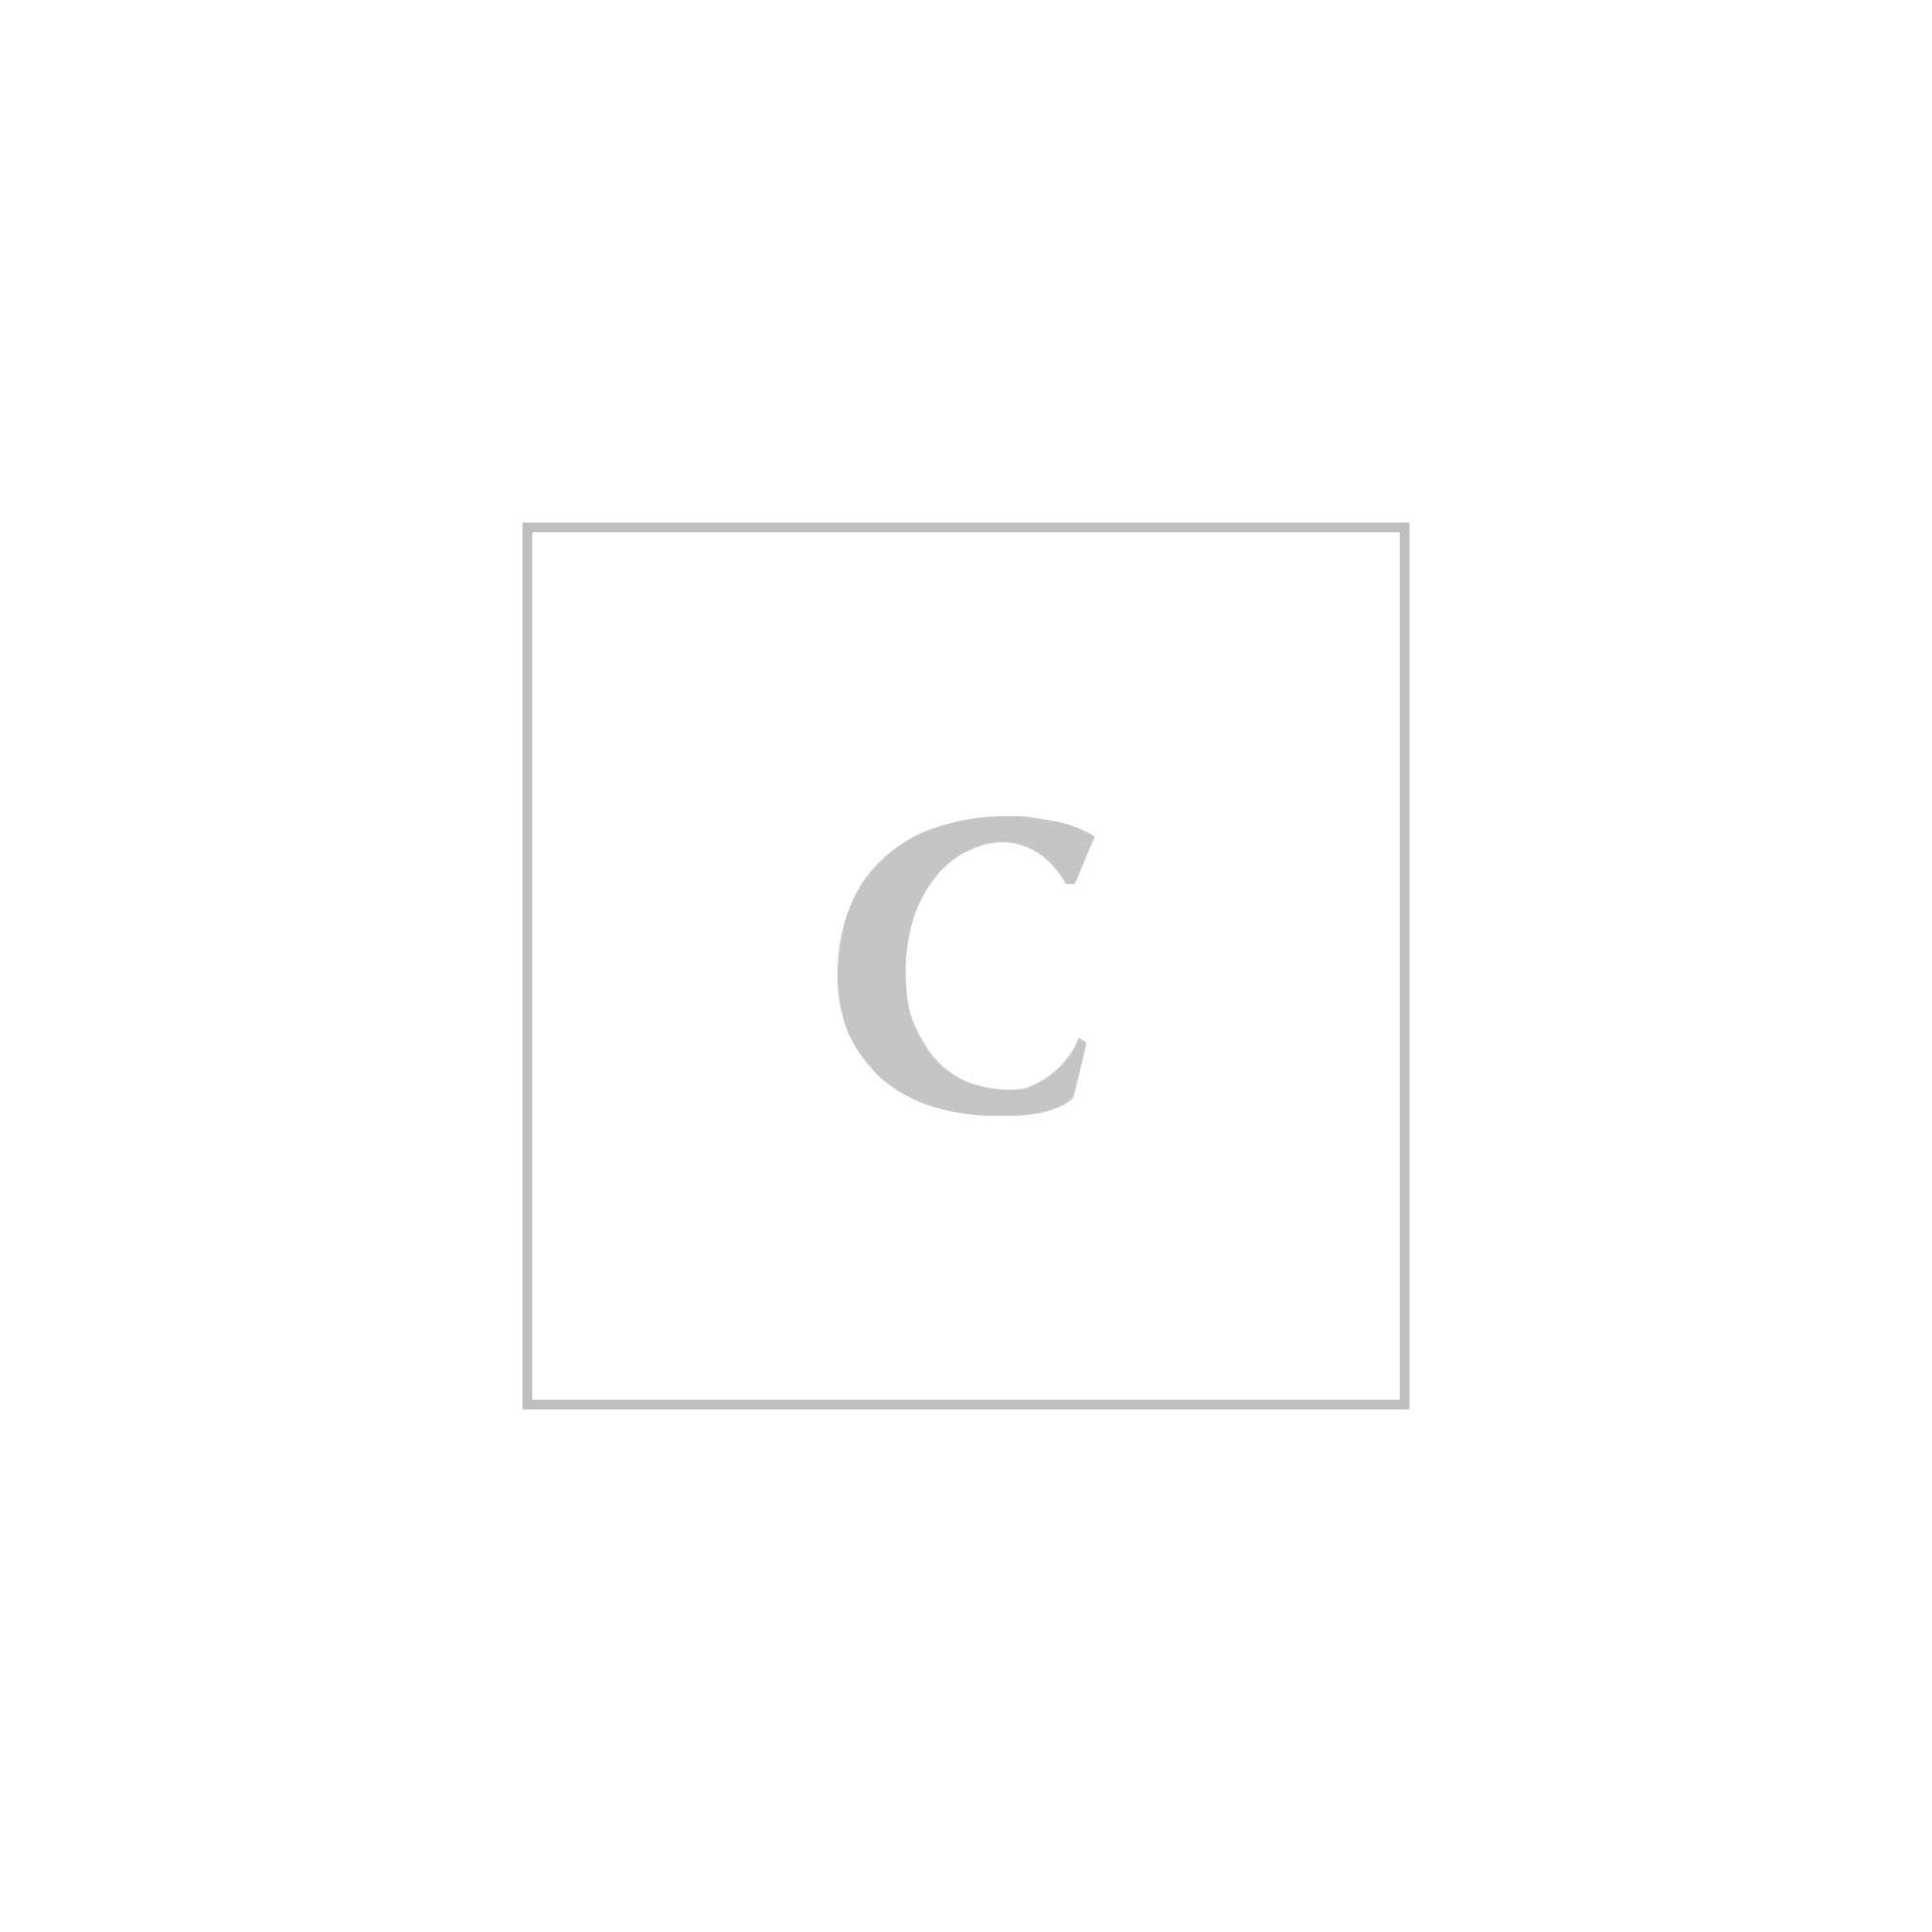 Dolce & gabbana mini bags pelle stampa iguana